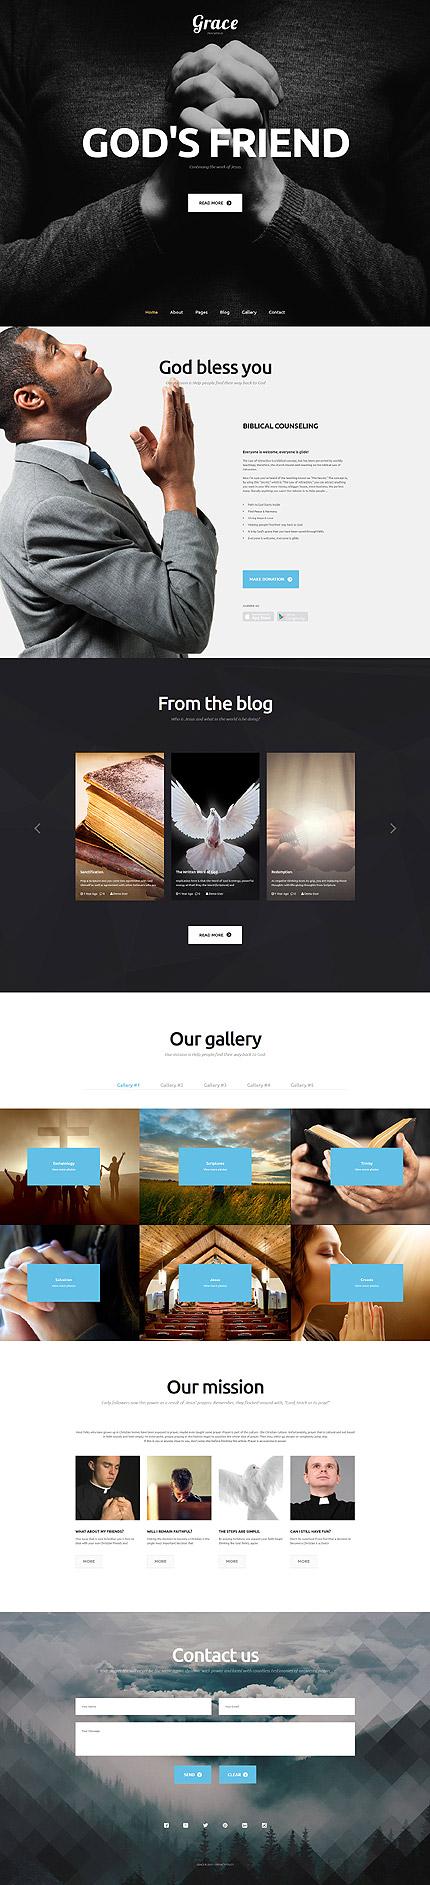 Joomla Theme/Template 55710 Main Page Screenshot